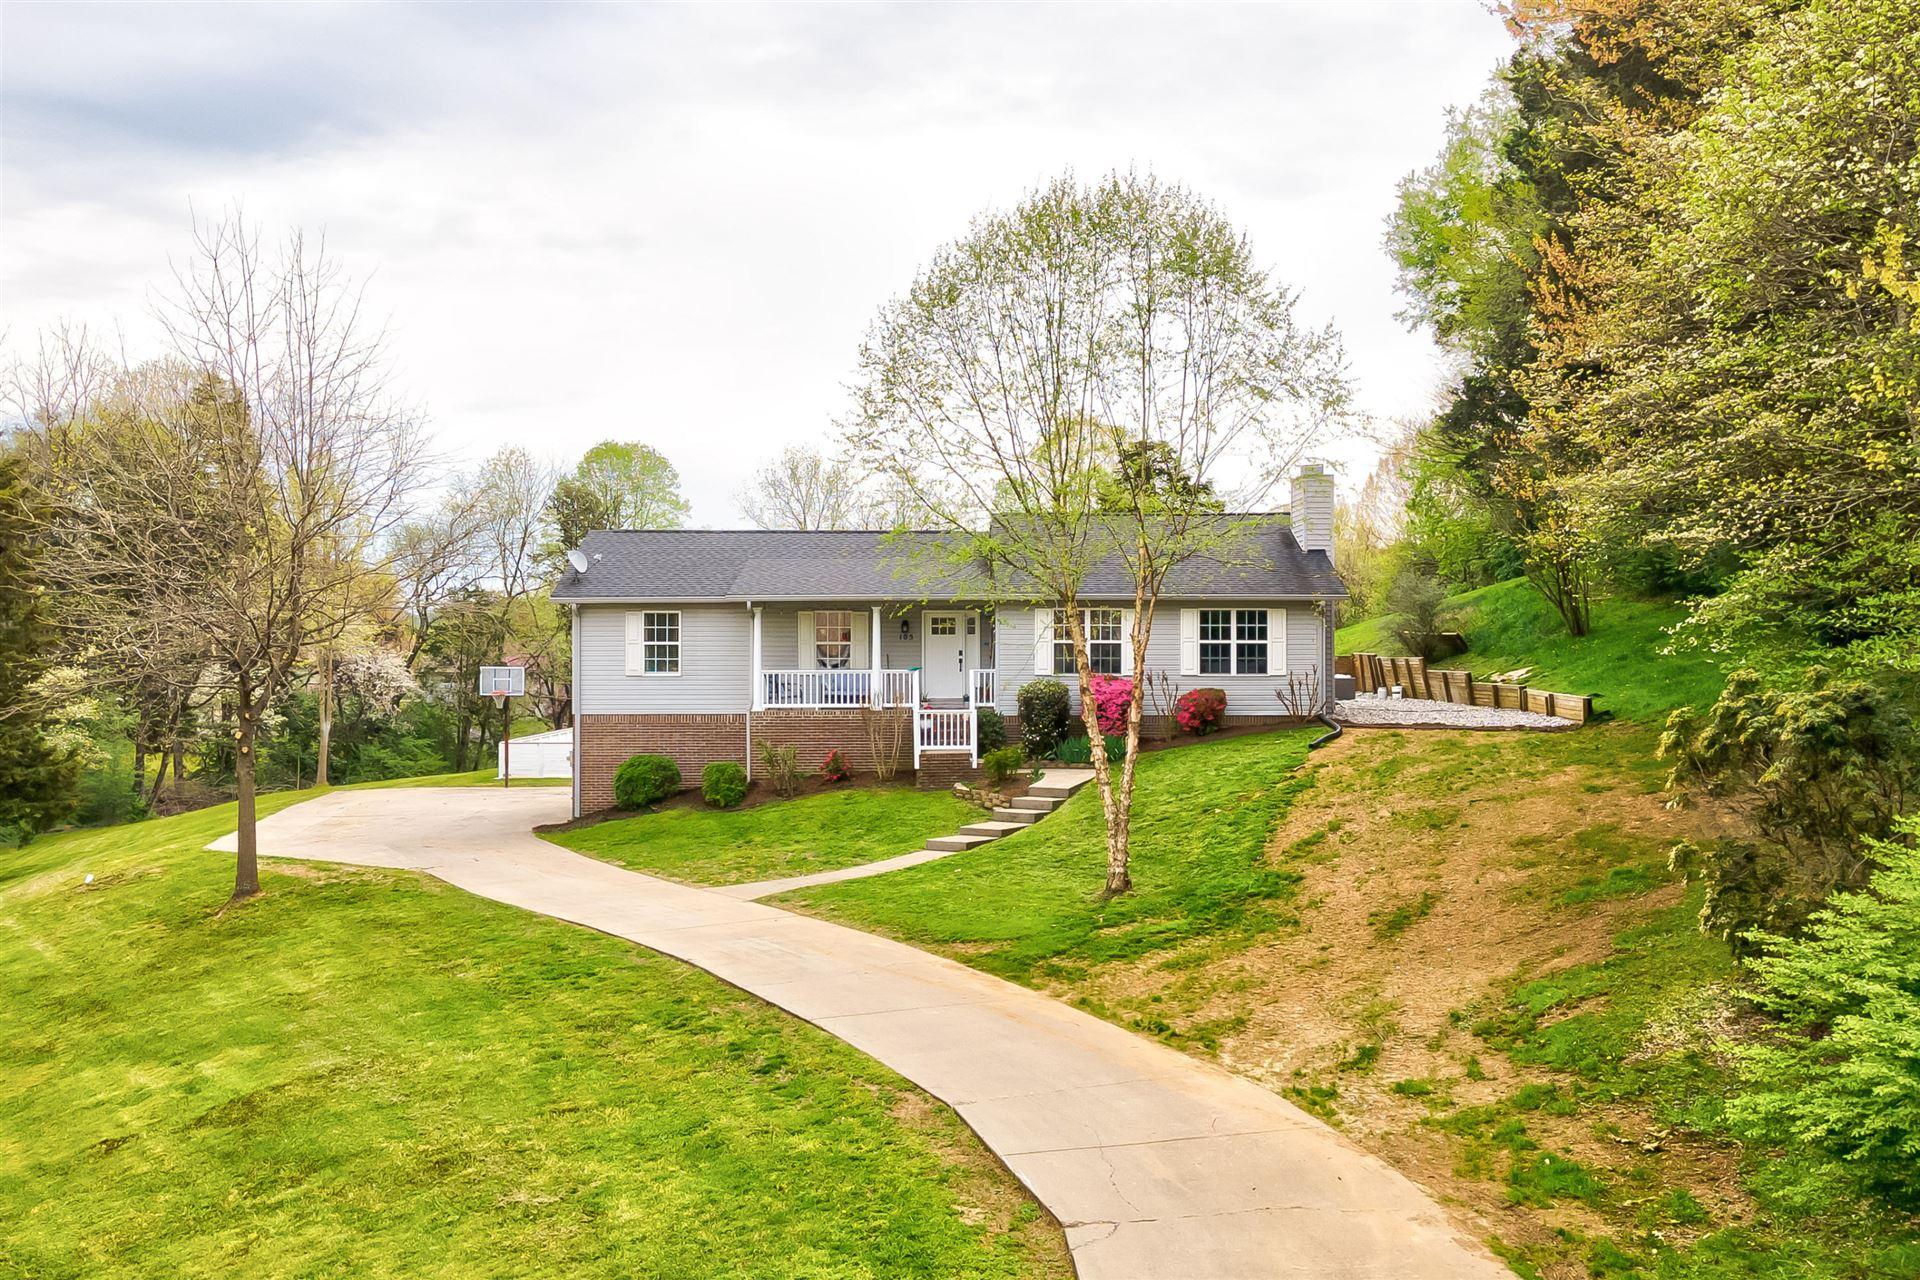 Photo of 105 Targa Lane, Oak Ridge, TN 37830 (MLS # 1149354)